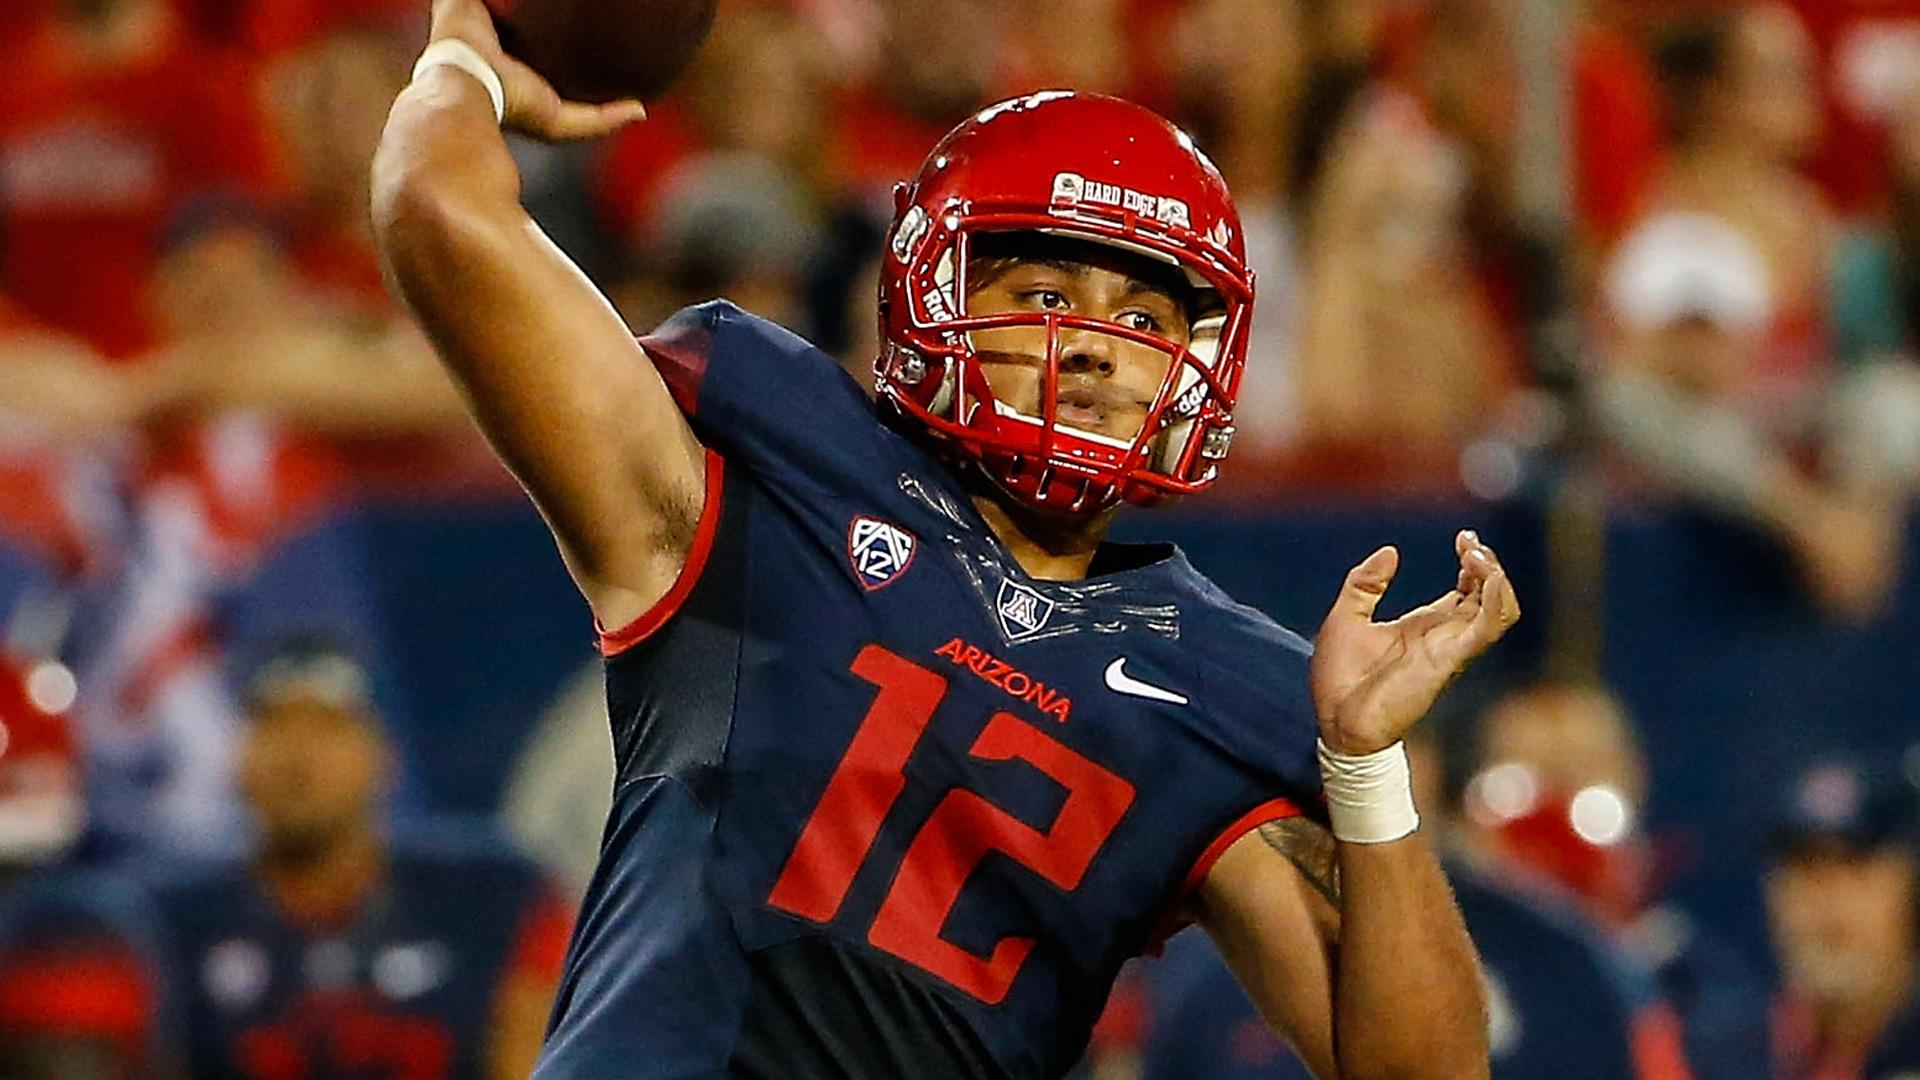 College football lines and picks – Vegas duo handicaps Saturday's slate